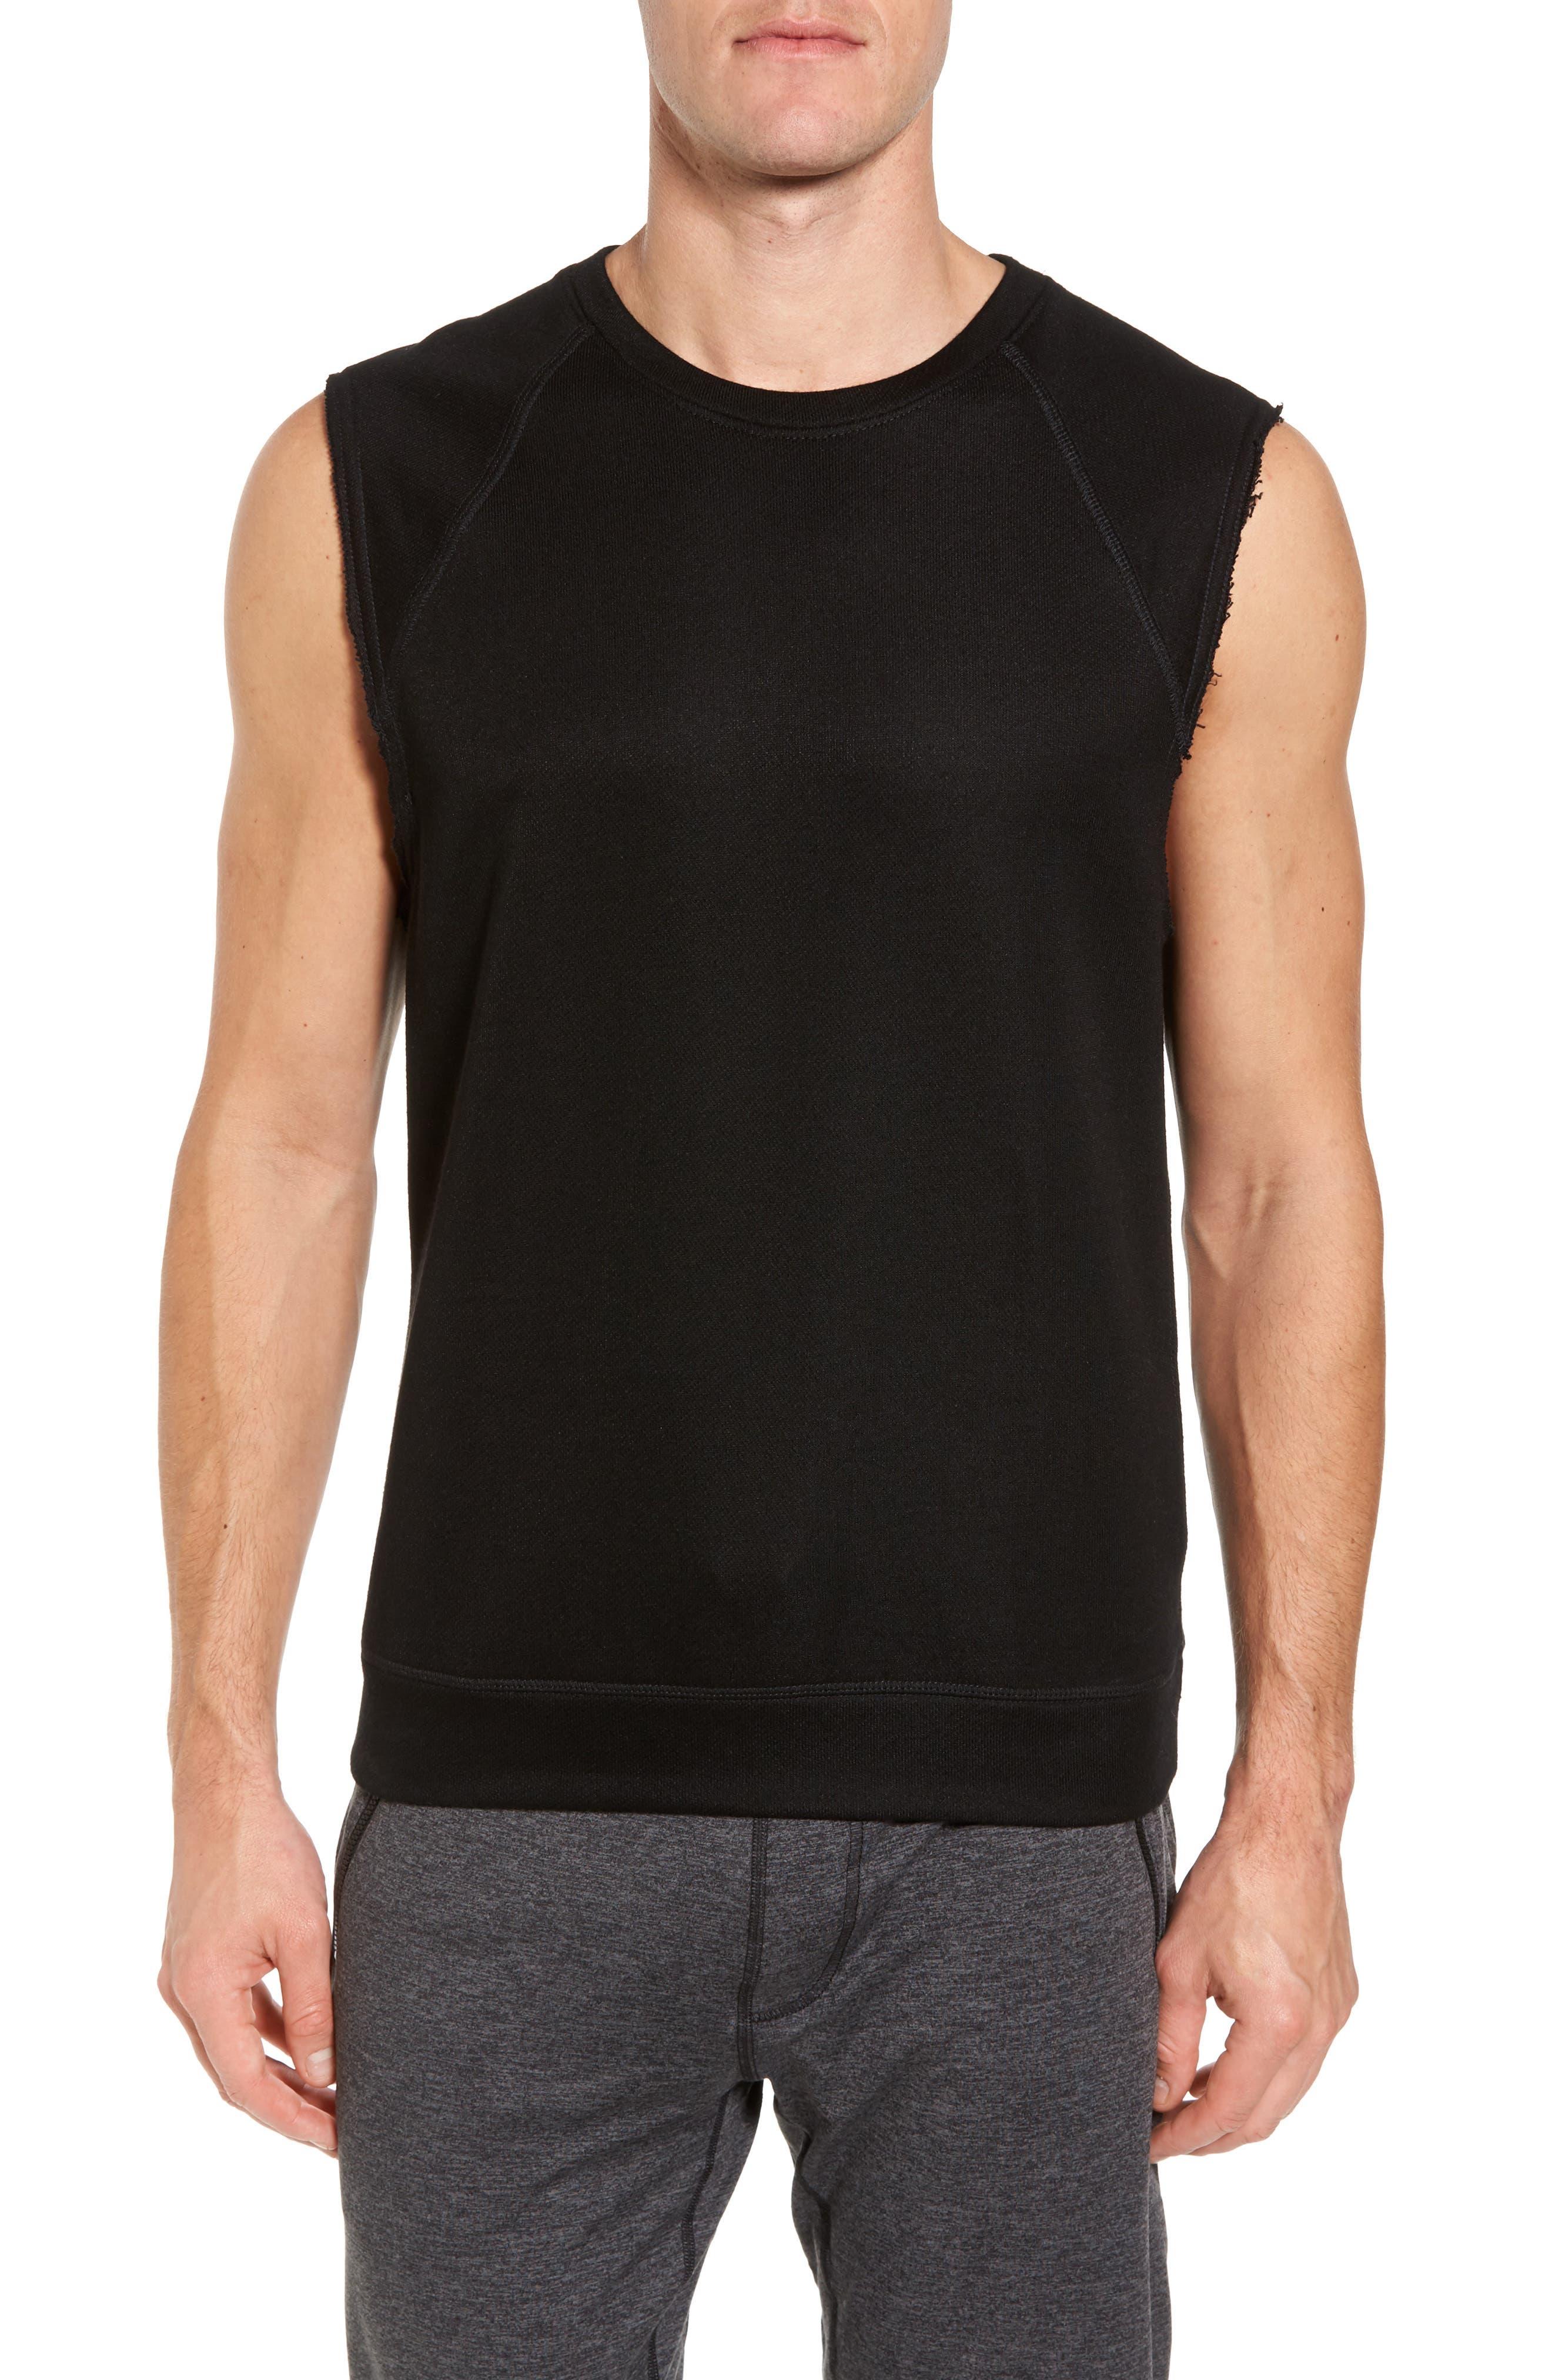 Dosha Relaxed Fit Sweatshirt Tank,                             Main thumbnail 1, color,                             BLACK